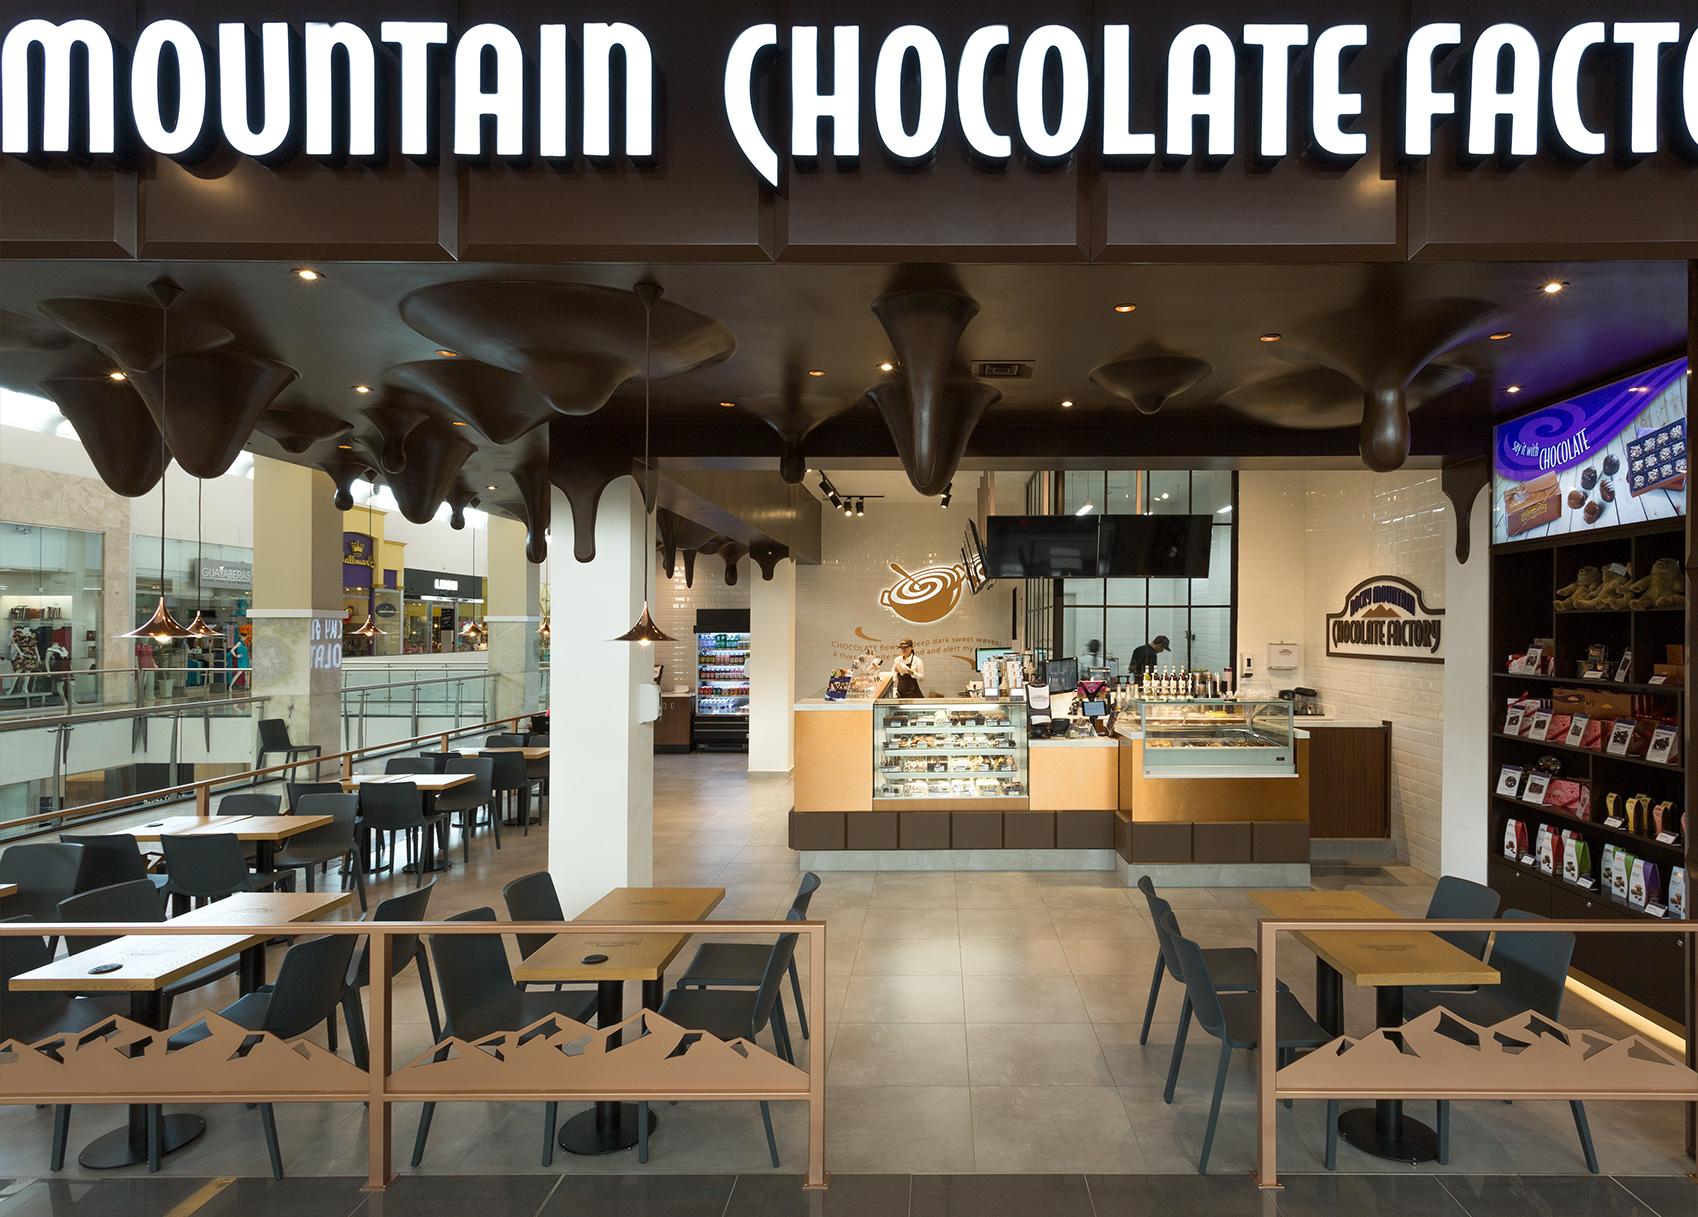 Rocky-Mountain-Chocolate-Factory-02